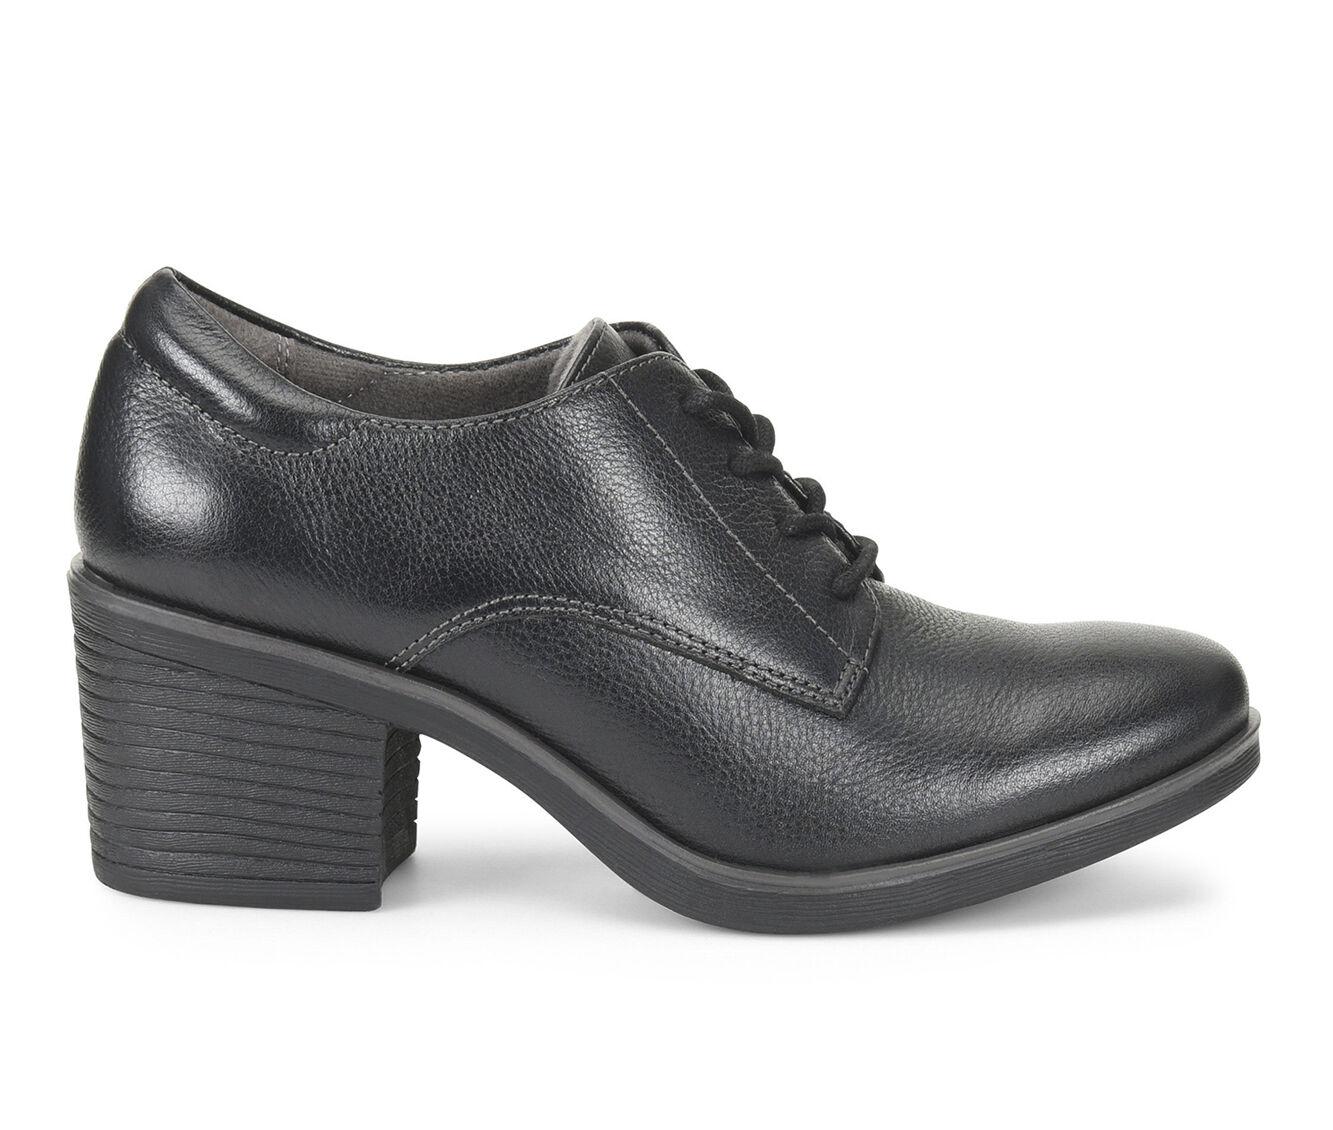 Women's EuroSoft Jules Shoes Black